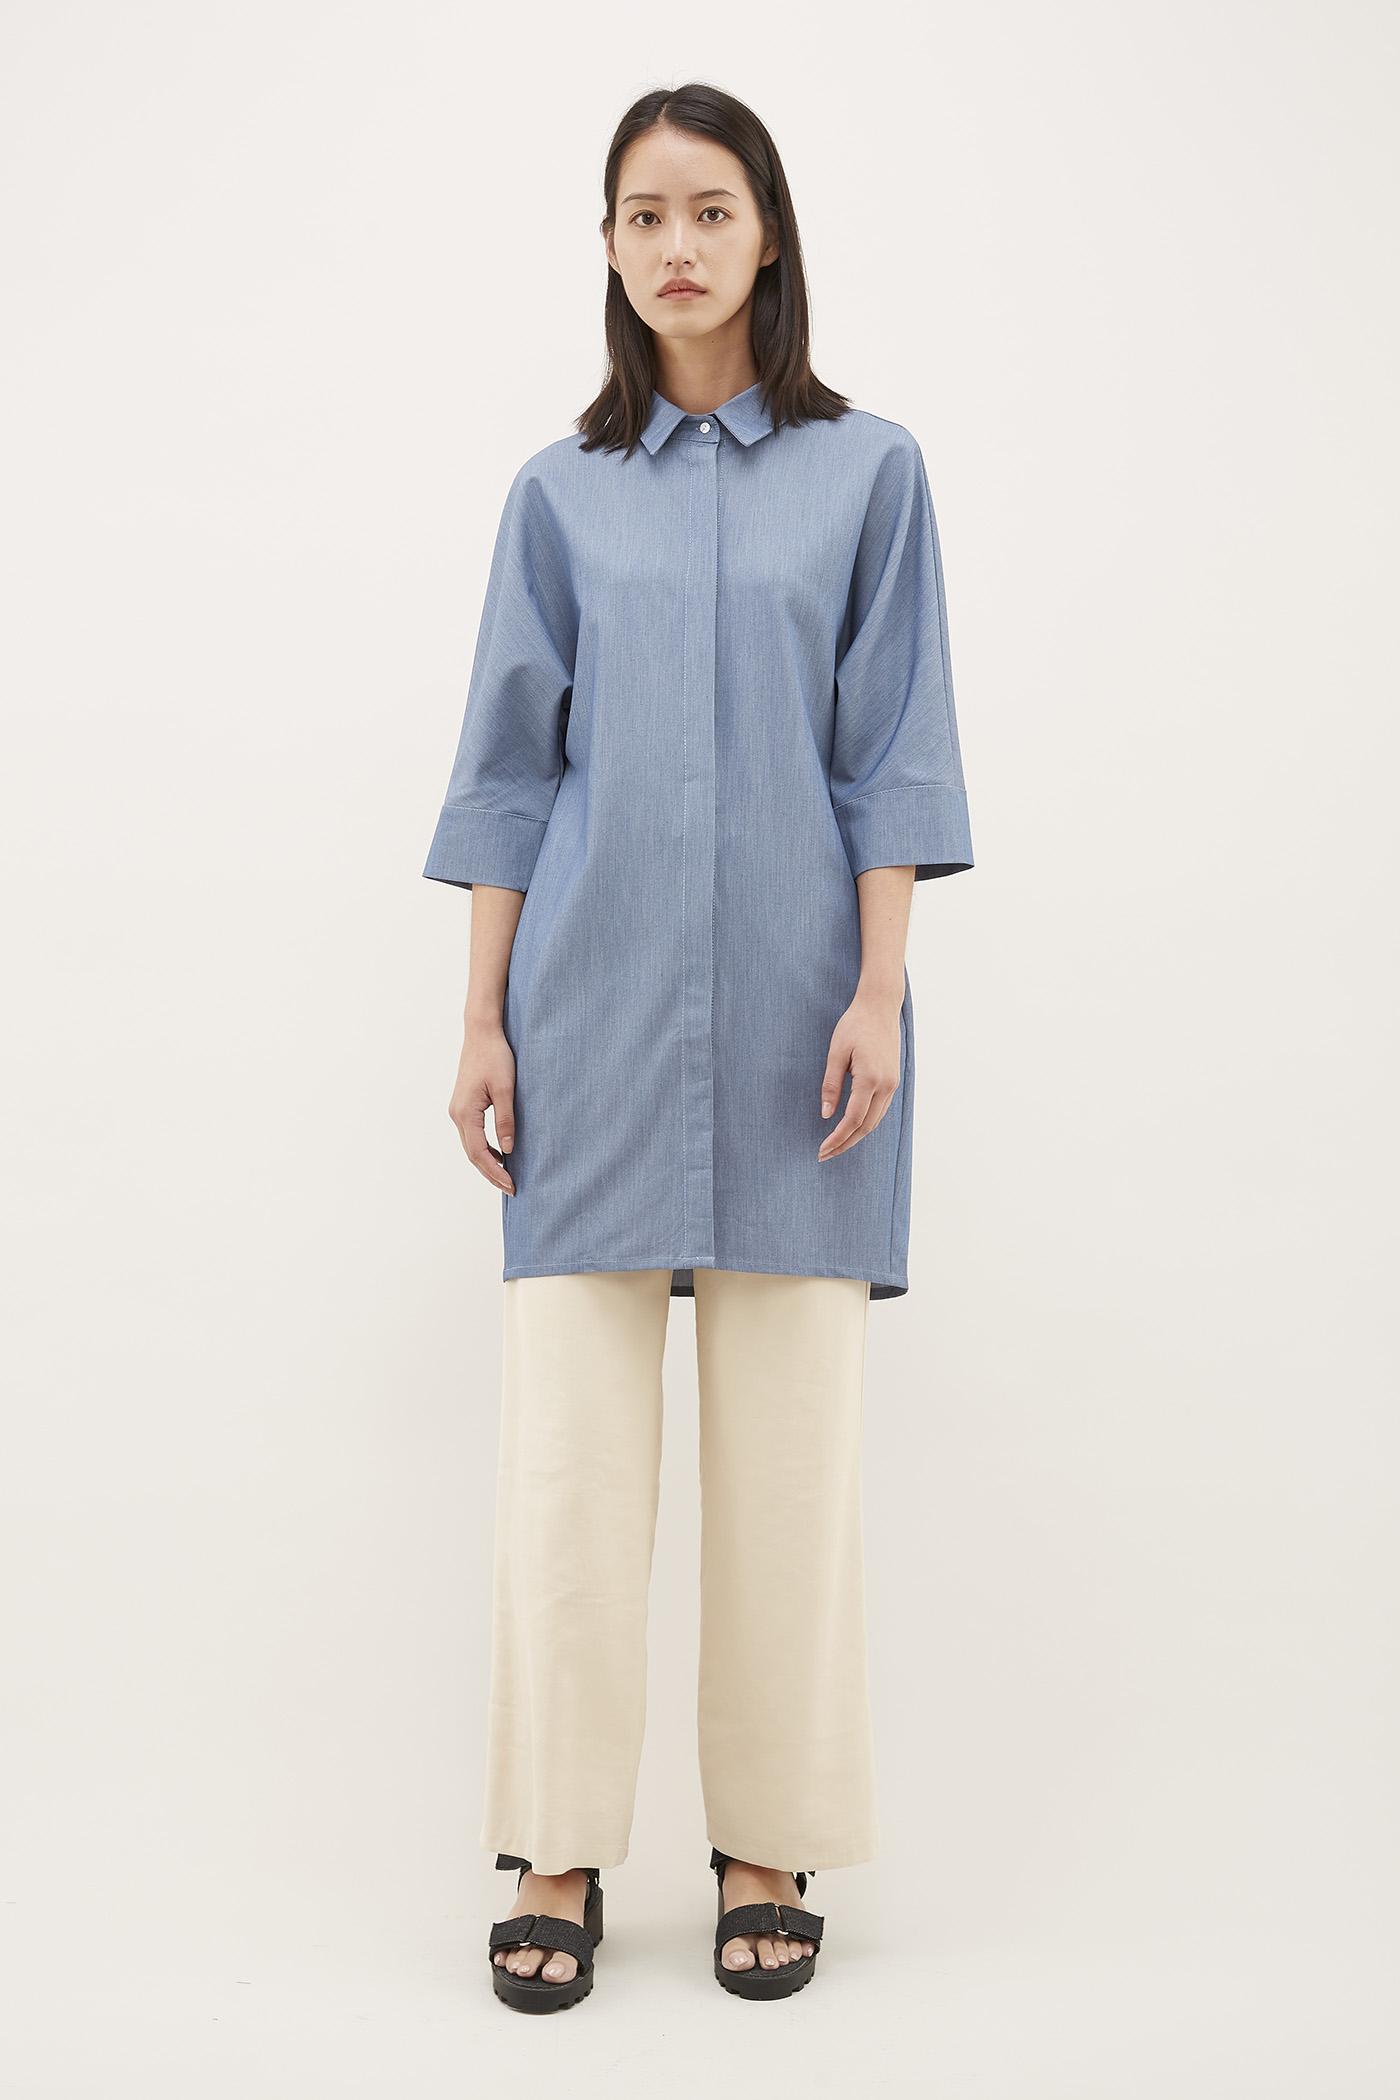 Phias Chambray Oversized Shirt